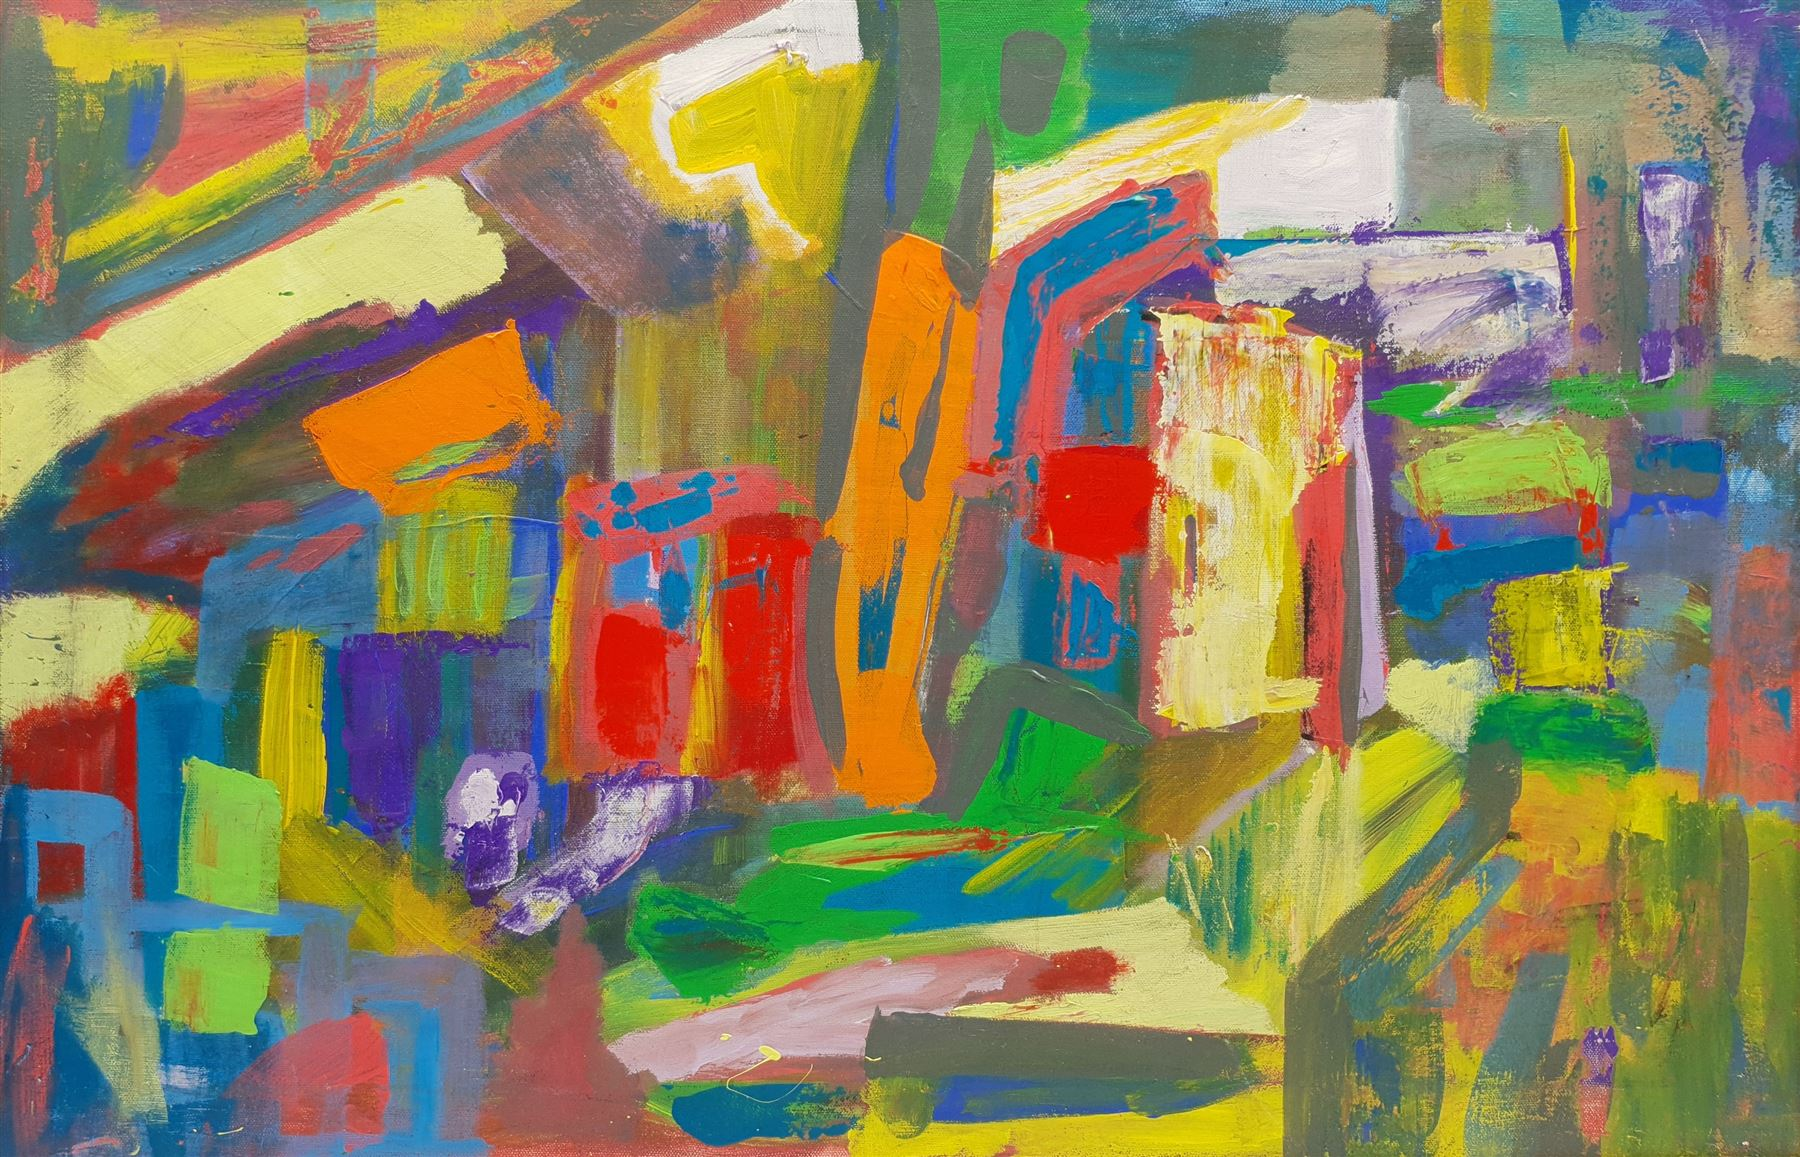 Geoffrey Harrop (British 1947-): 'Souk' - Arabian Abstract